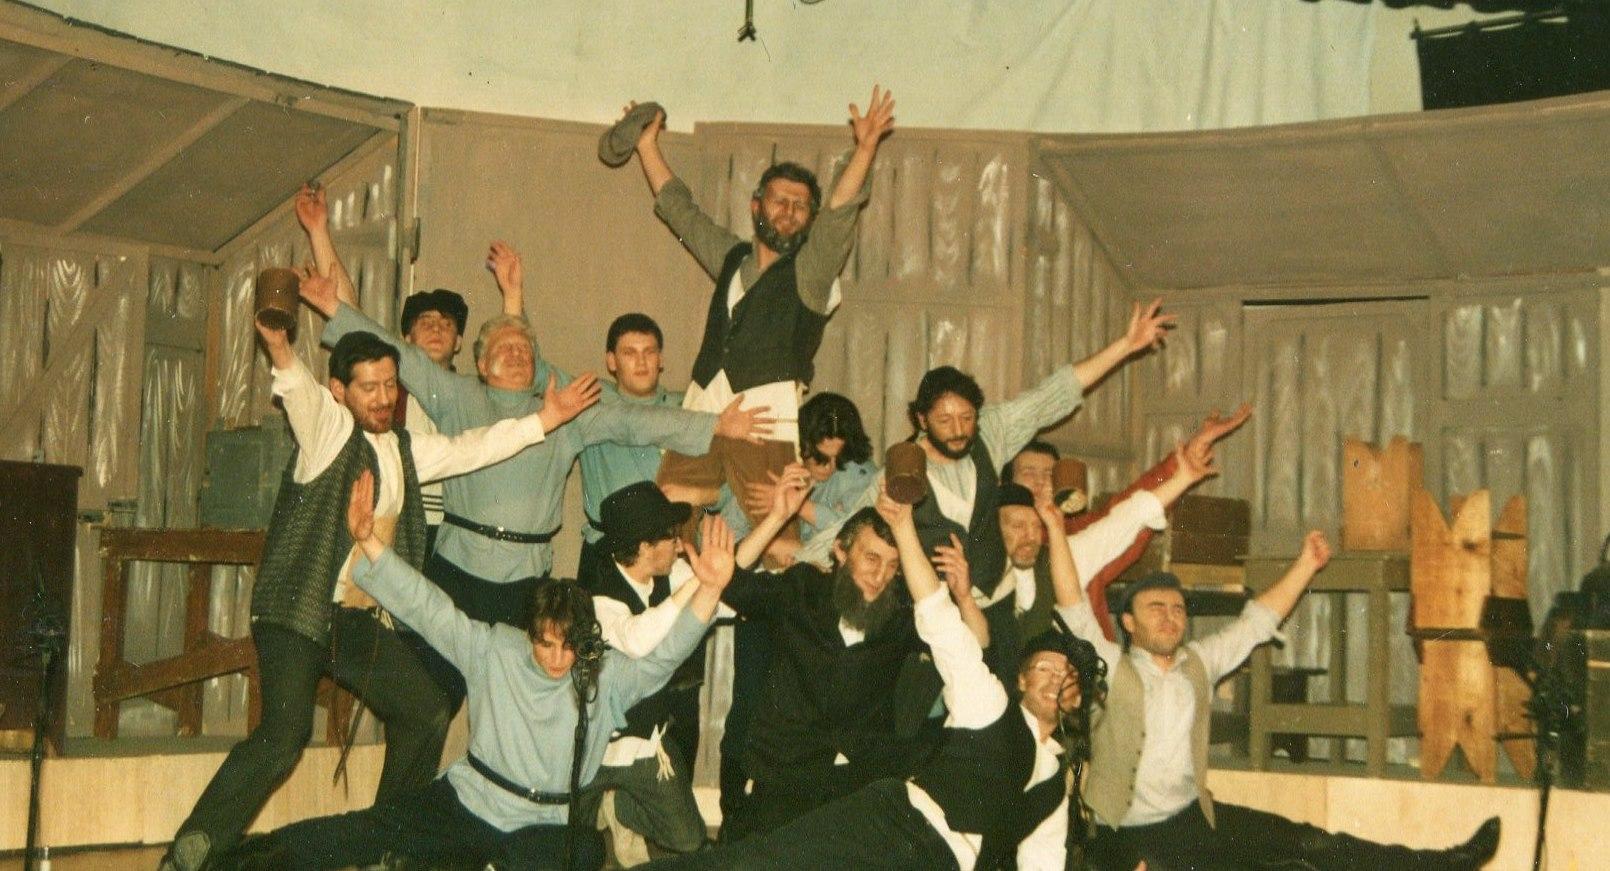 Fiddler on the Roof, 1991 (www.lmvg.ie) (31)